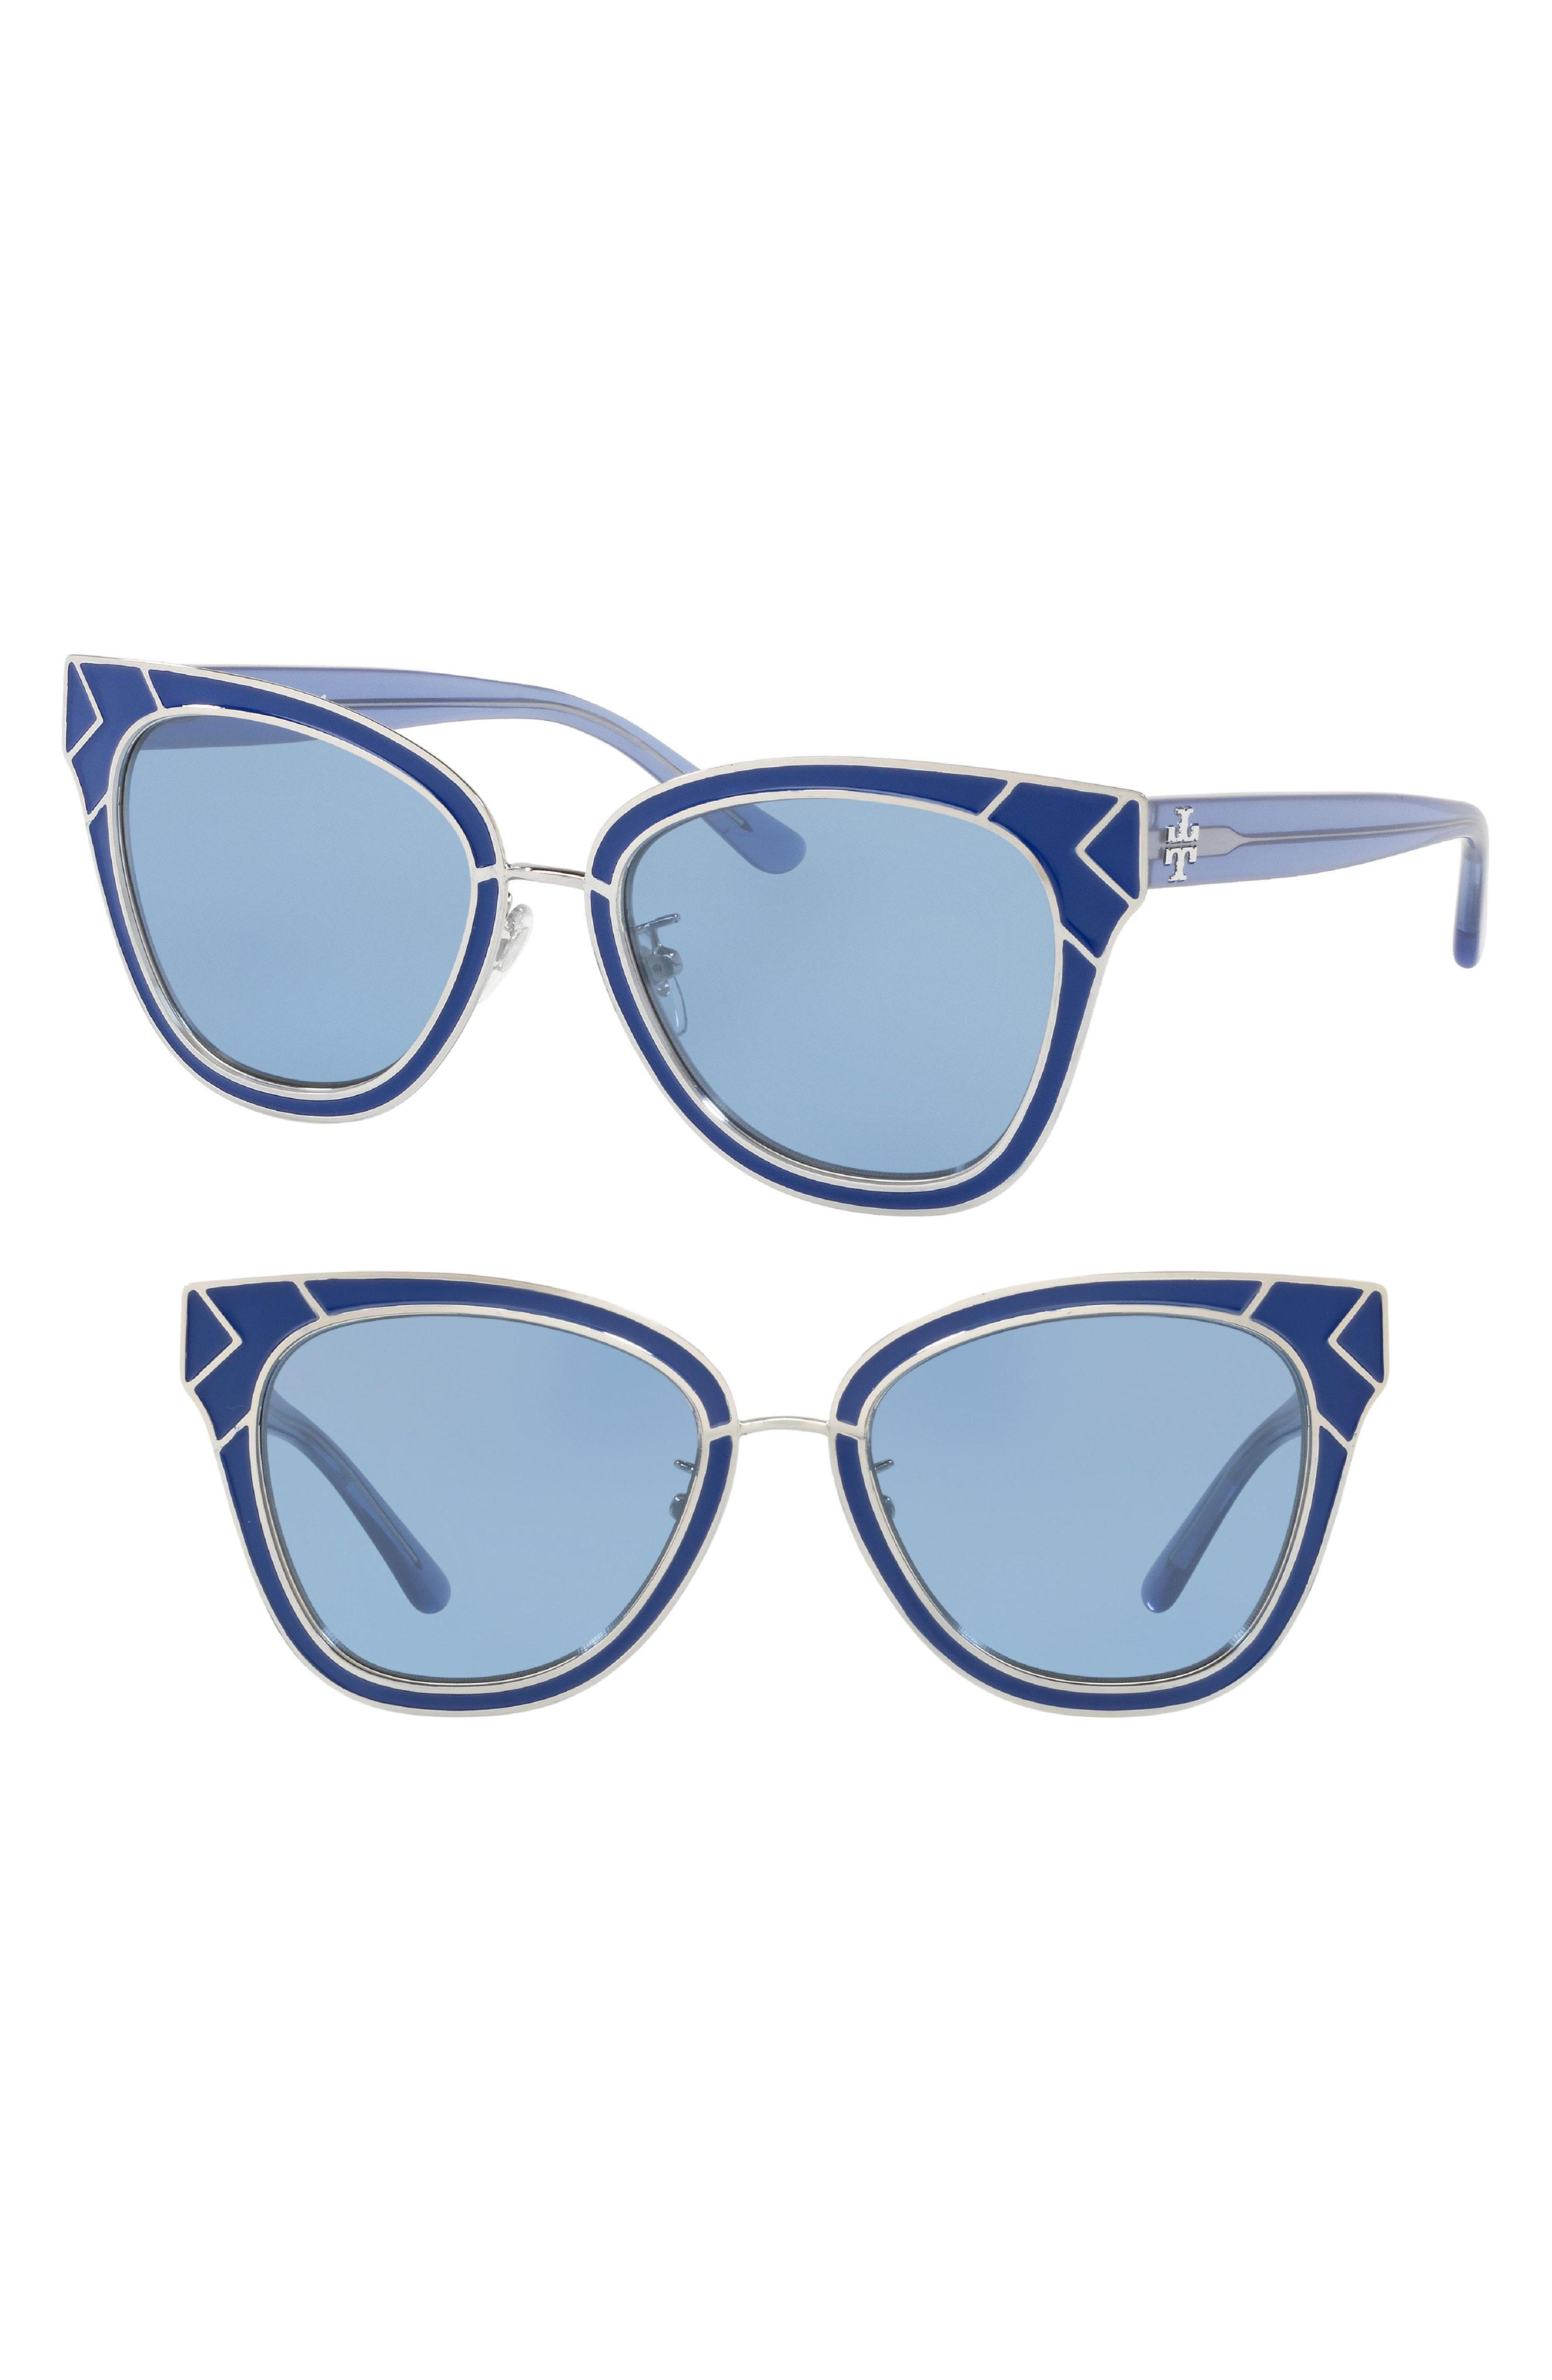 fdaa52ee86 Lyst - Tory Burch Enamel San Ray 53mm Sunglasses - in Blue